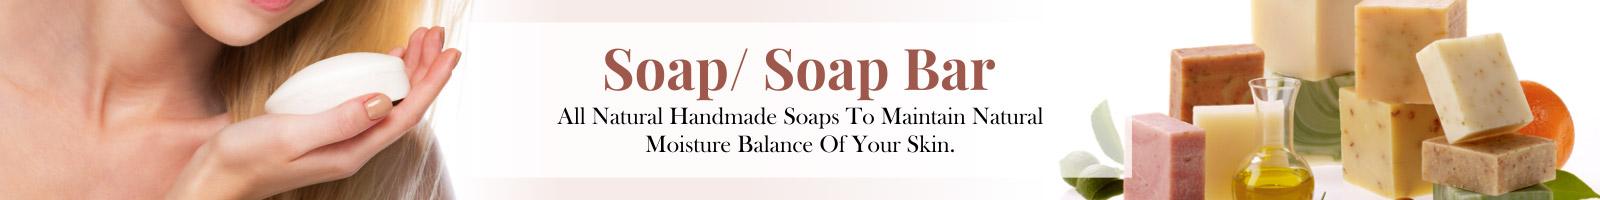 Soaps/ Soap Bar